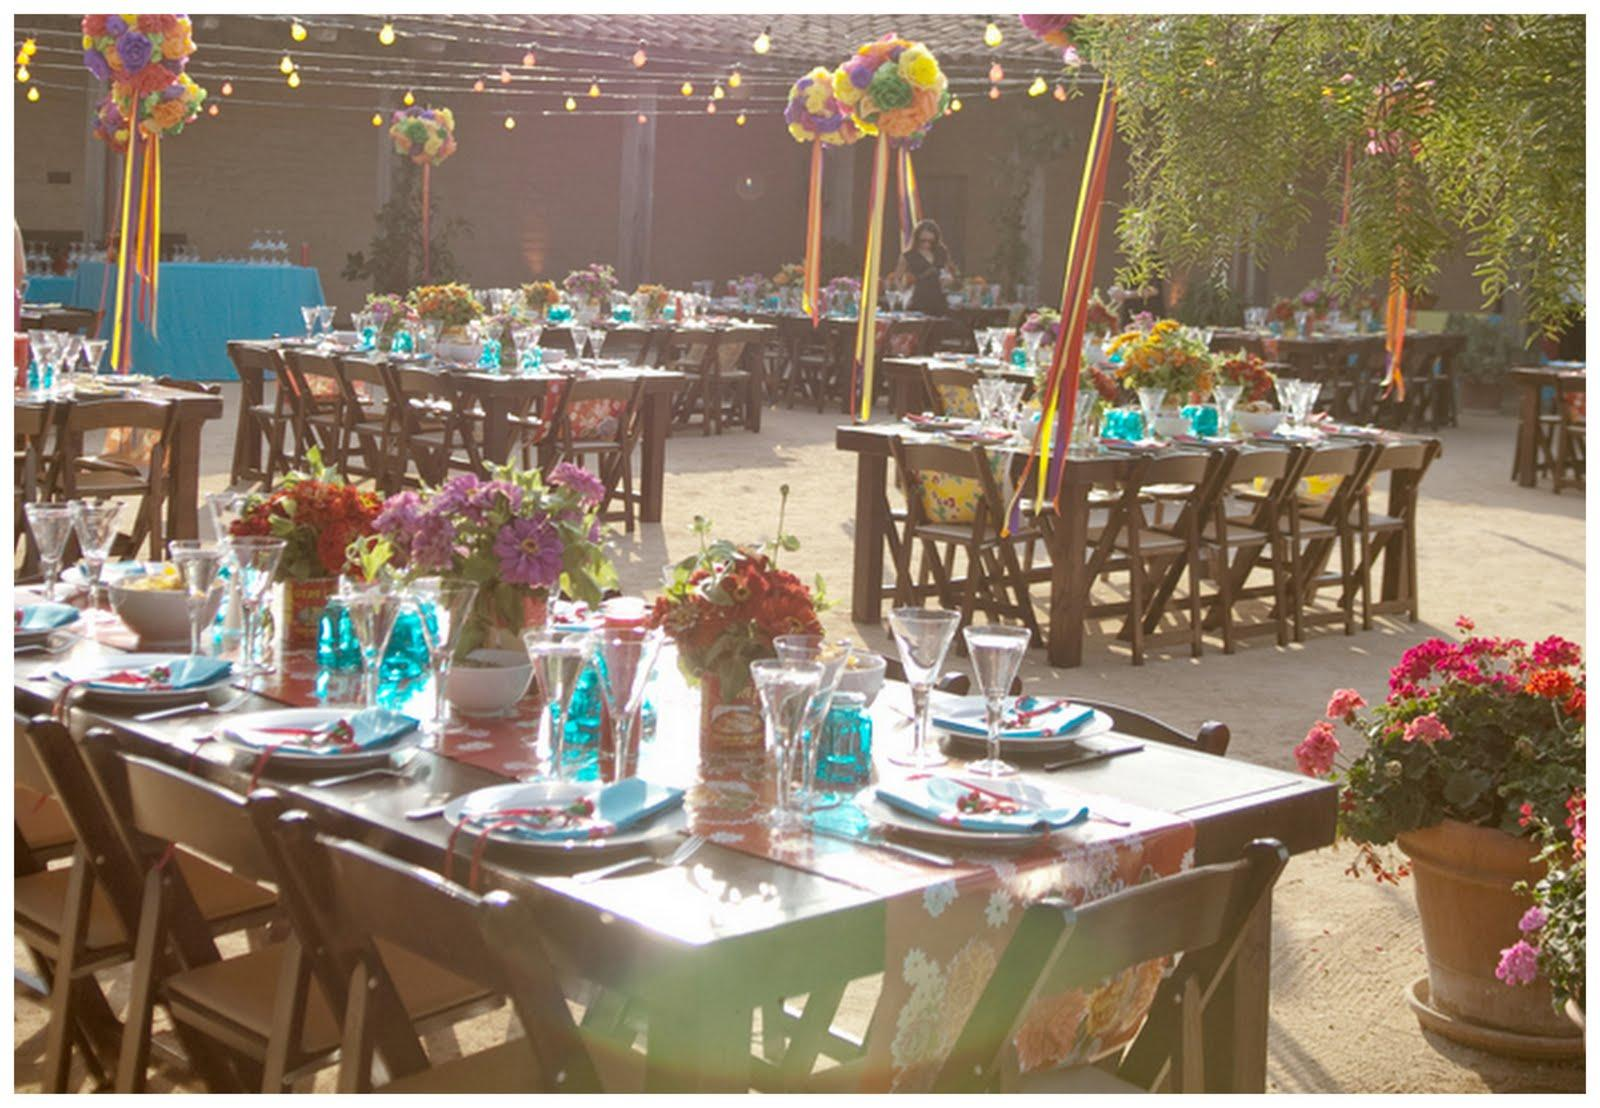 Mexican Themed Wedding Ideas MexicanThemed Wedding Decor Ideas that ...